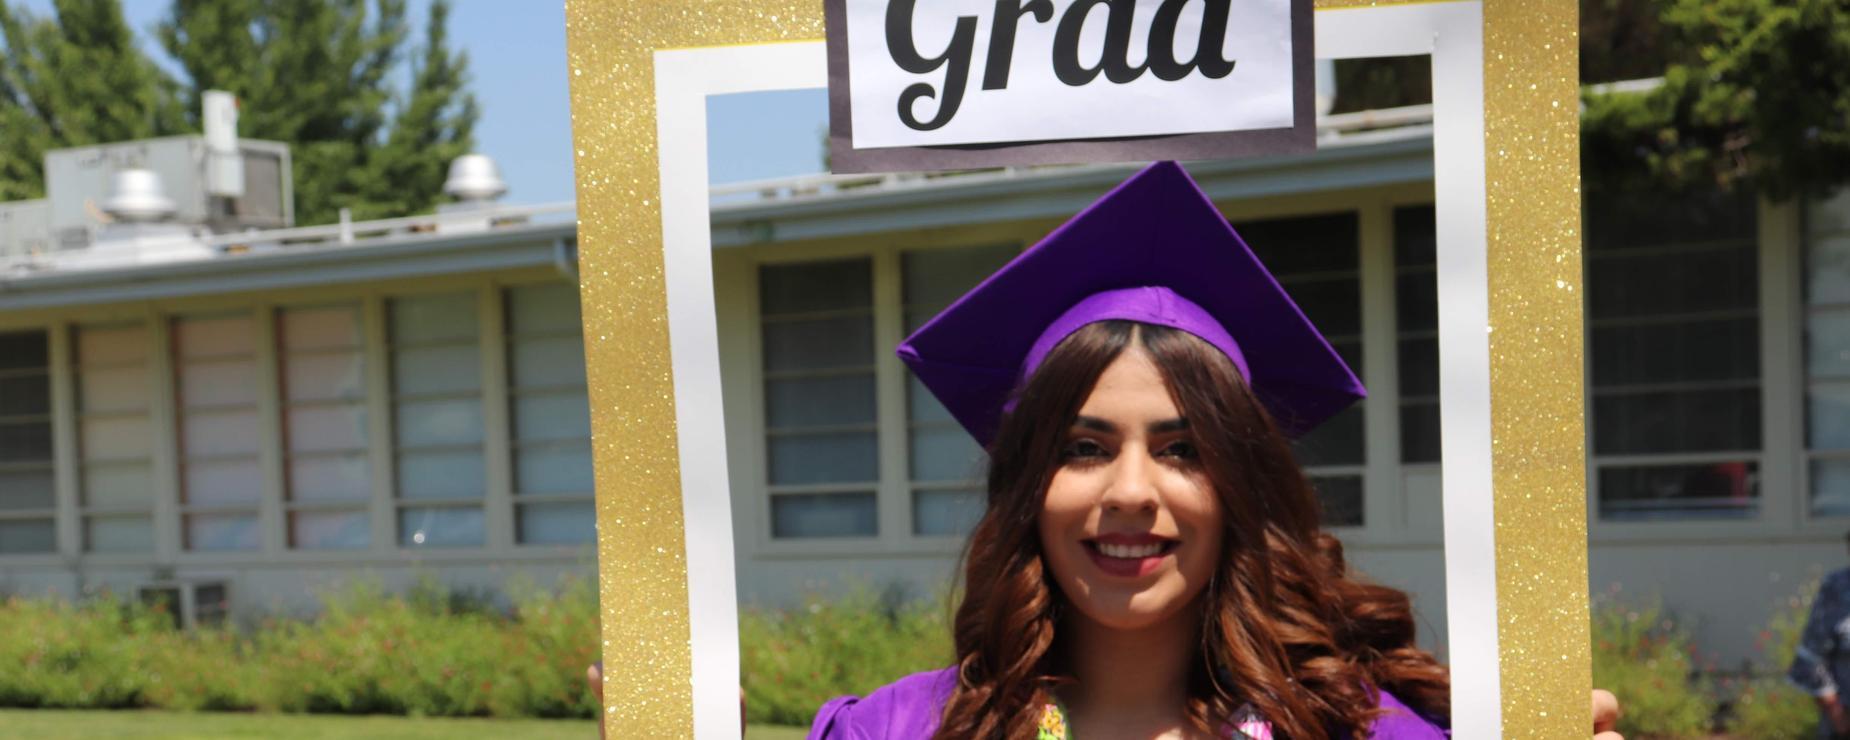 Gateway Graduate